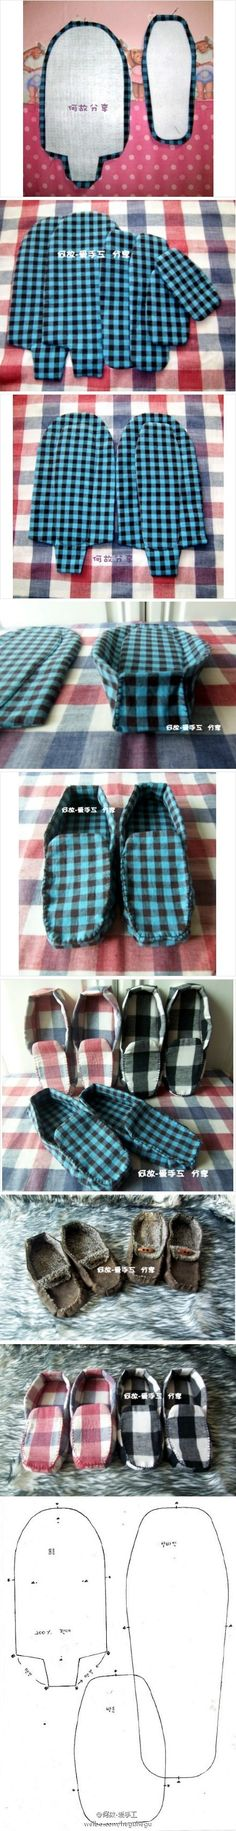 slippers tutorial